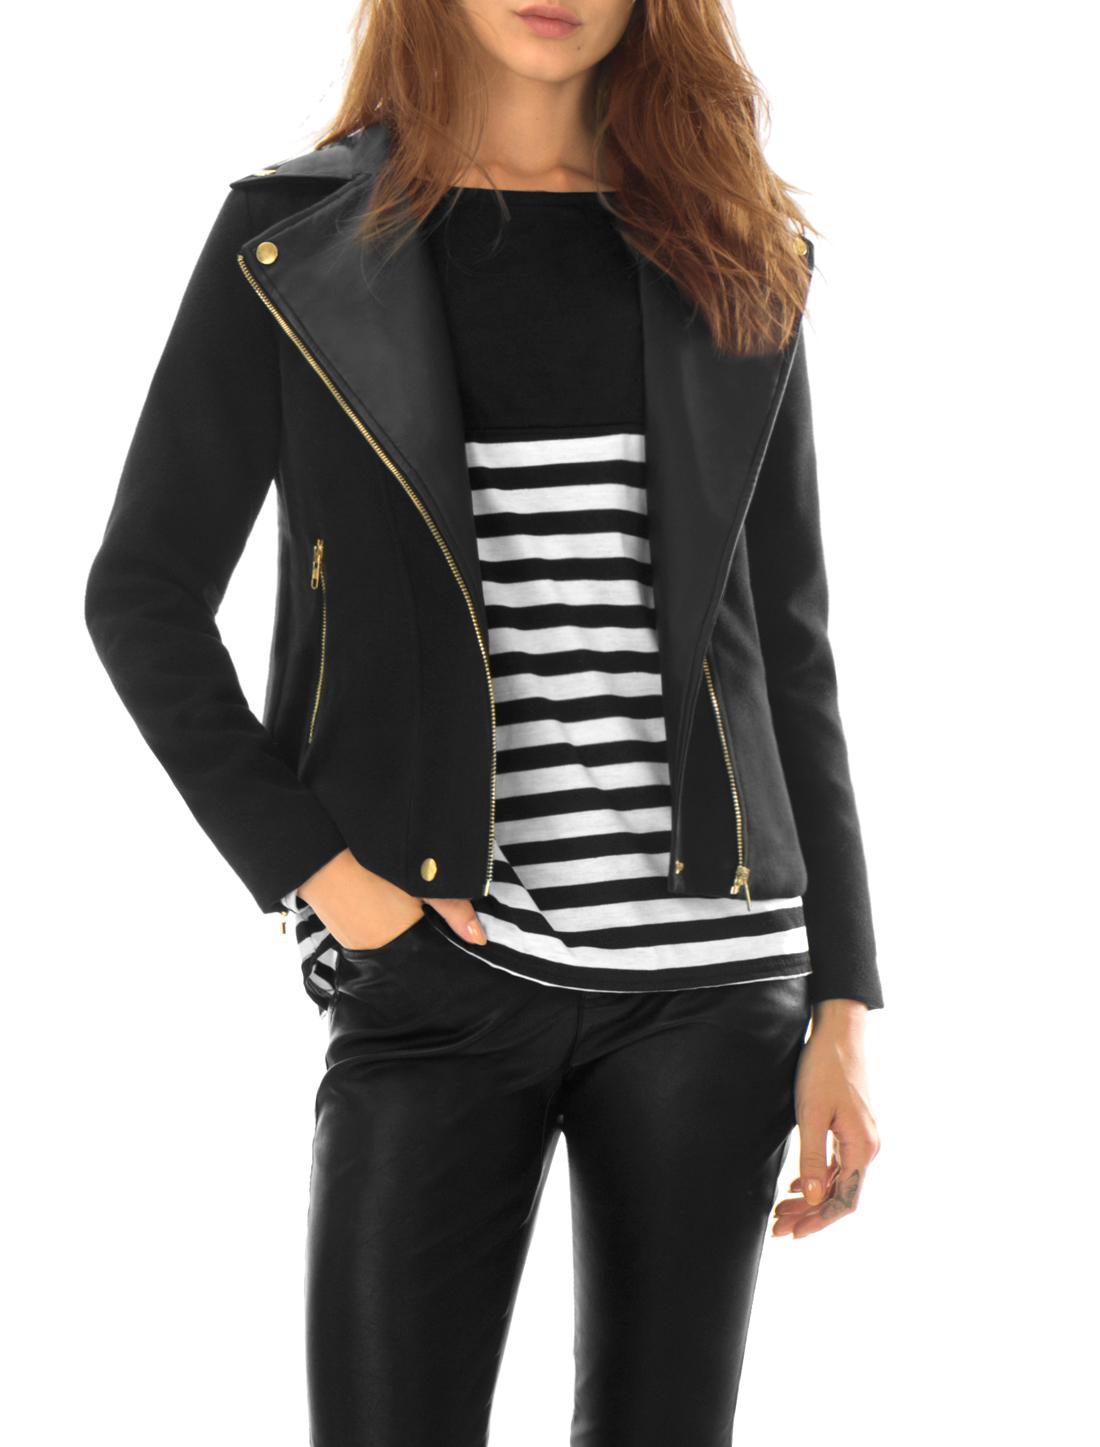 Women Asymmetrical Zipper Front PU Panel Worsted Jacket Black M